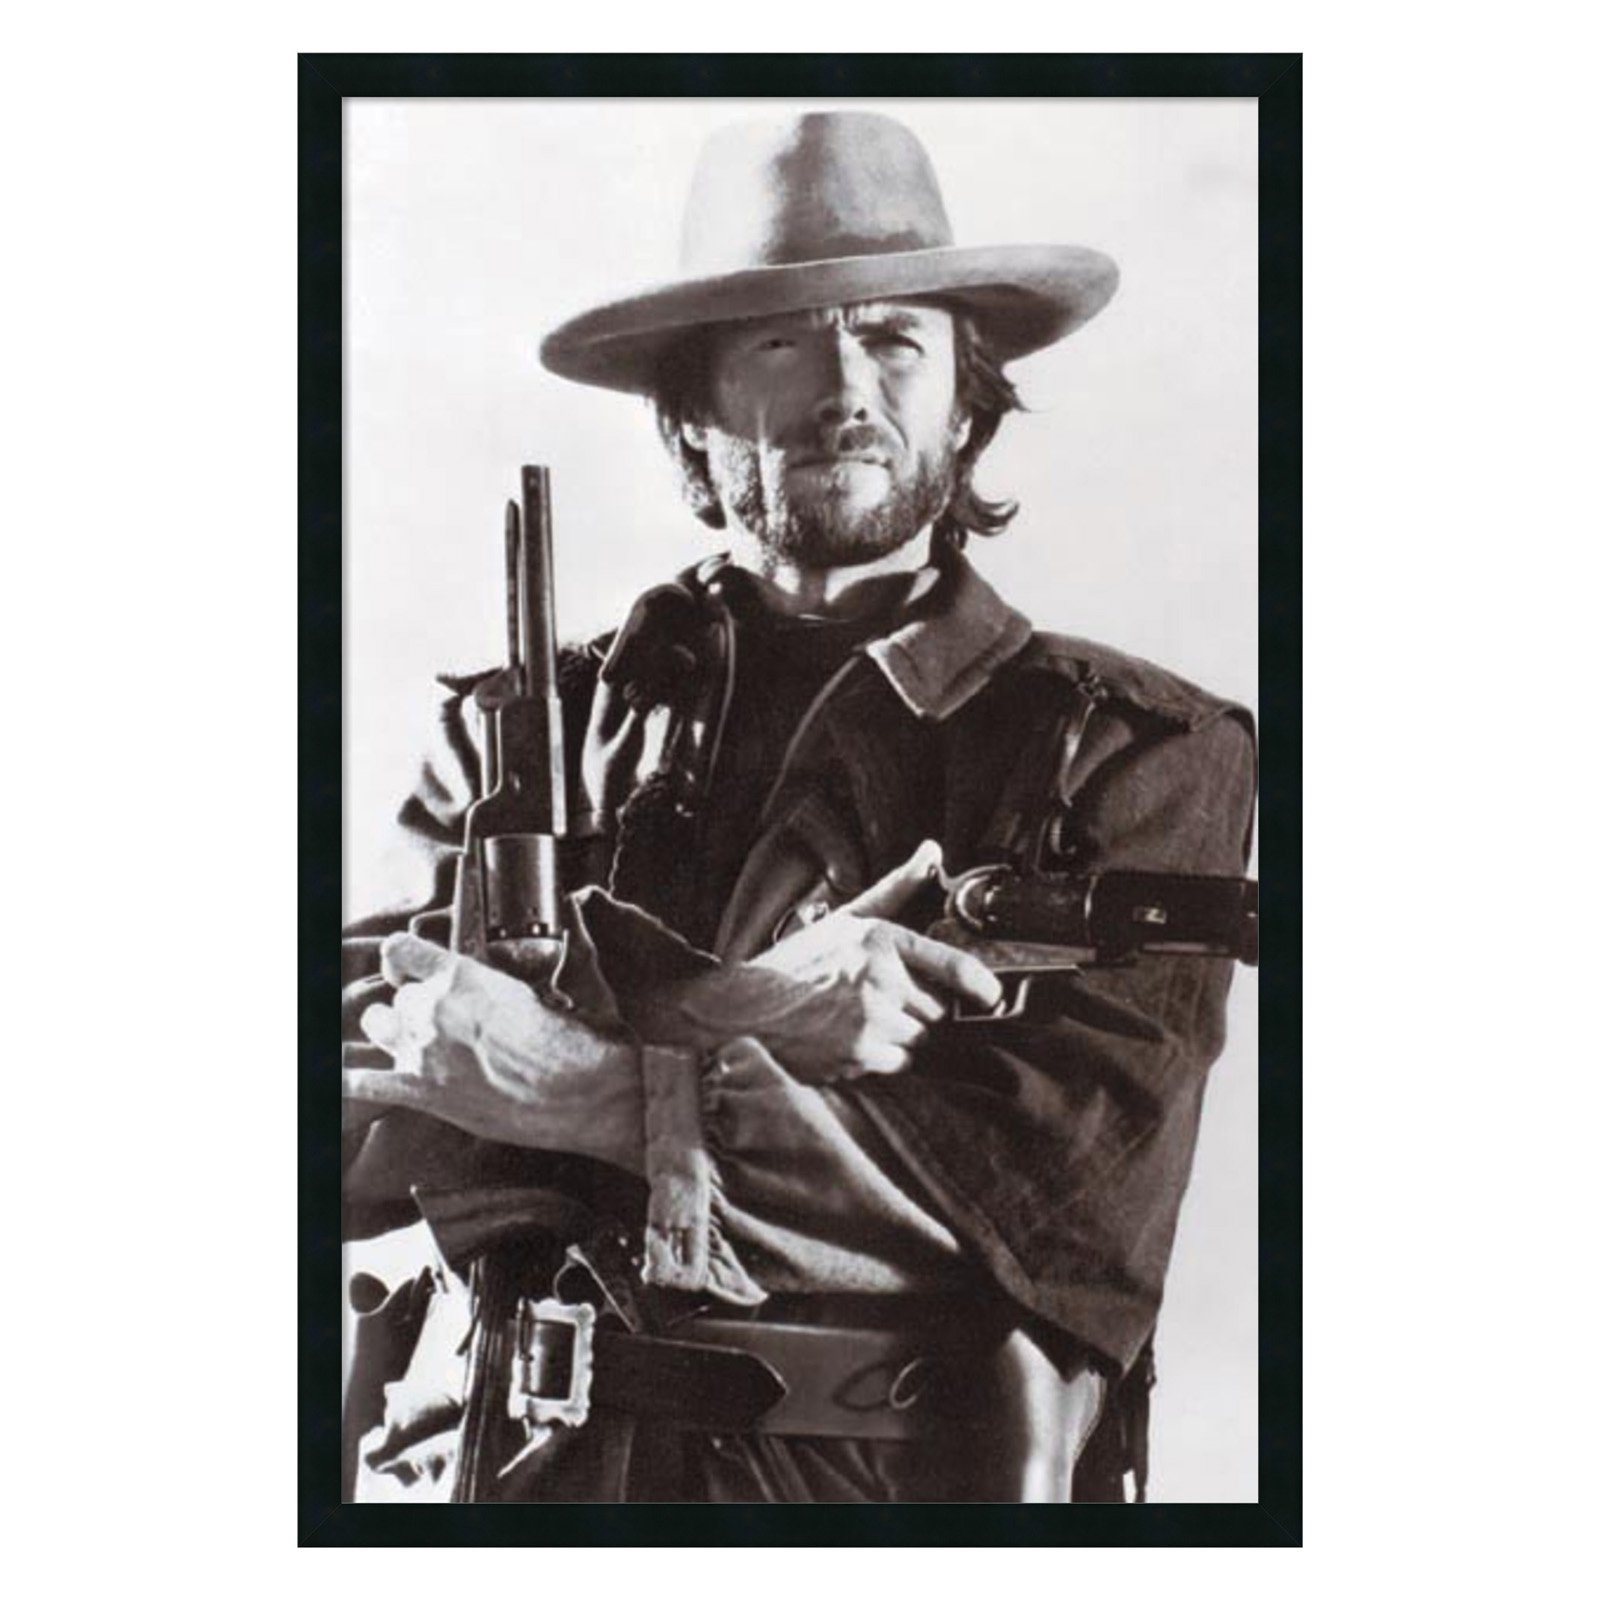 Clint Eastwood Framed Wall Artwork 25.41W x 37.41H in. by Amanti Art